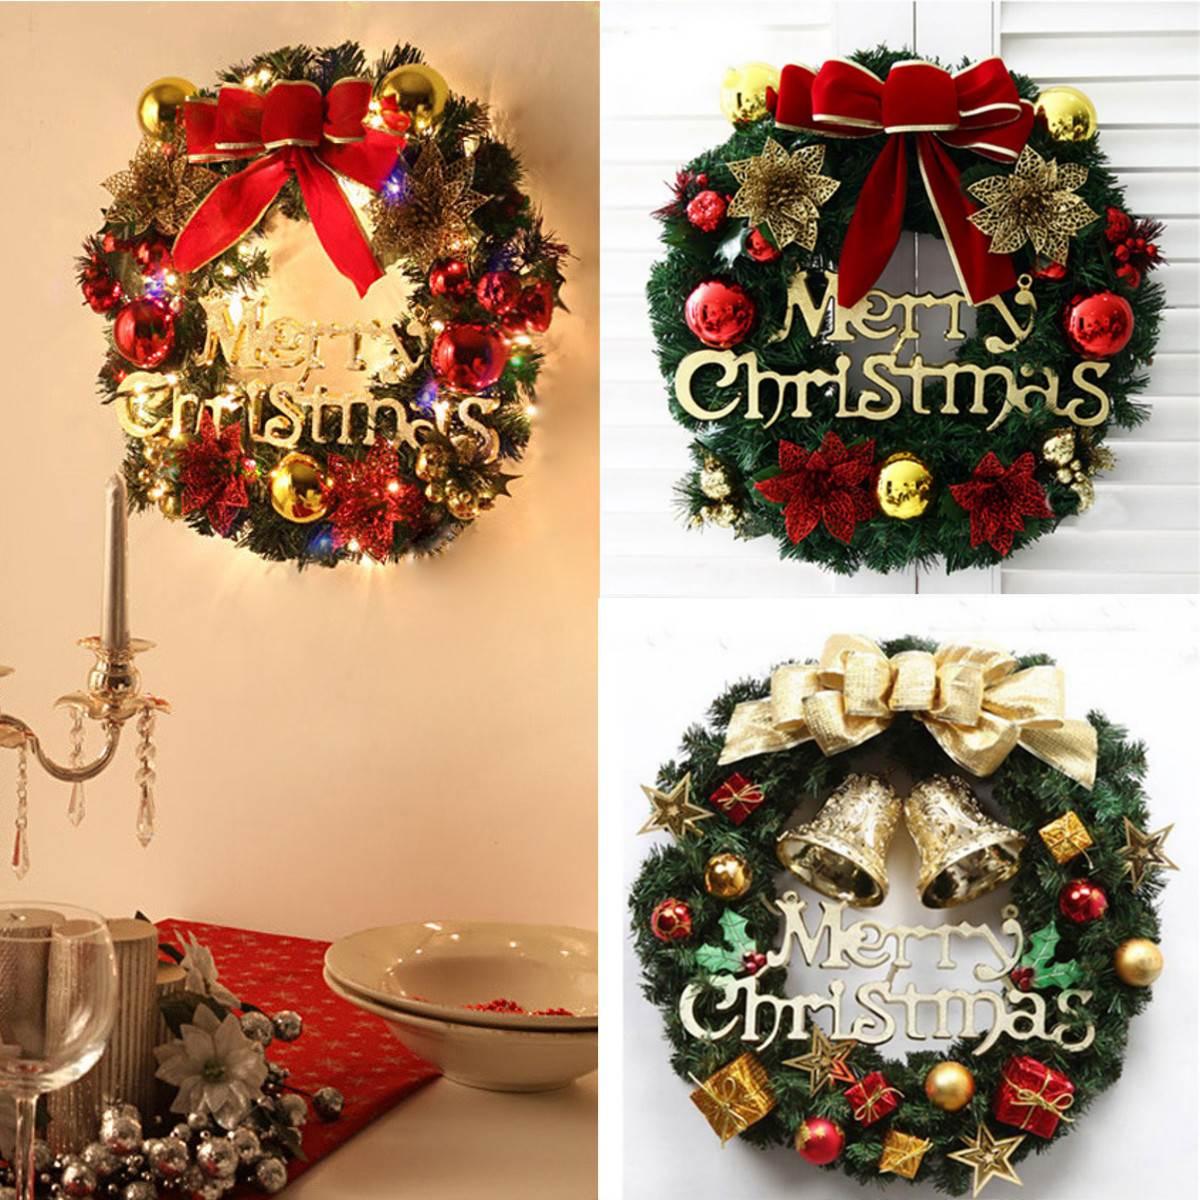 New Year Christmas Tree Wreath Door Wall Hanging Ornaments Garland ...